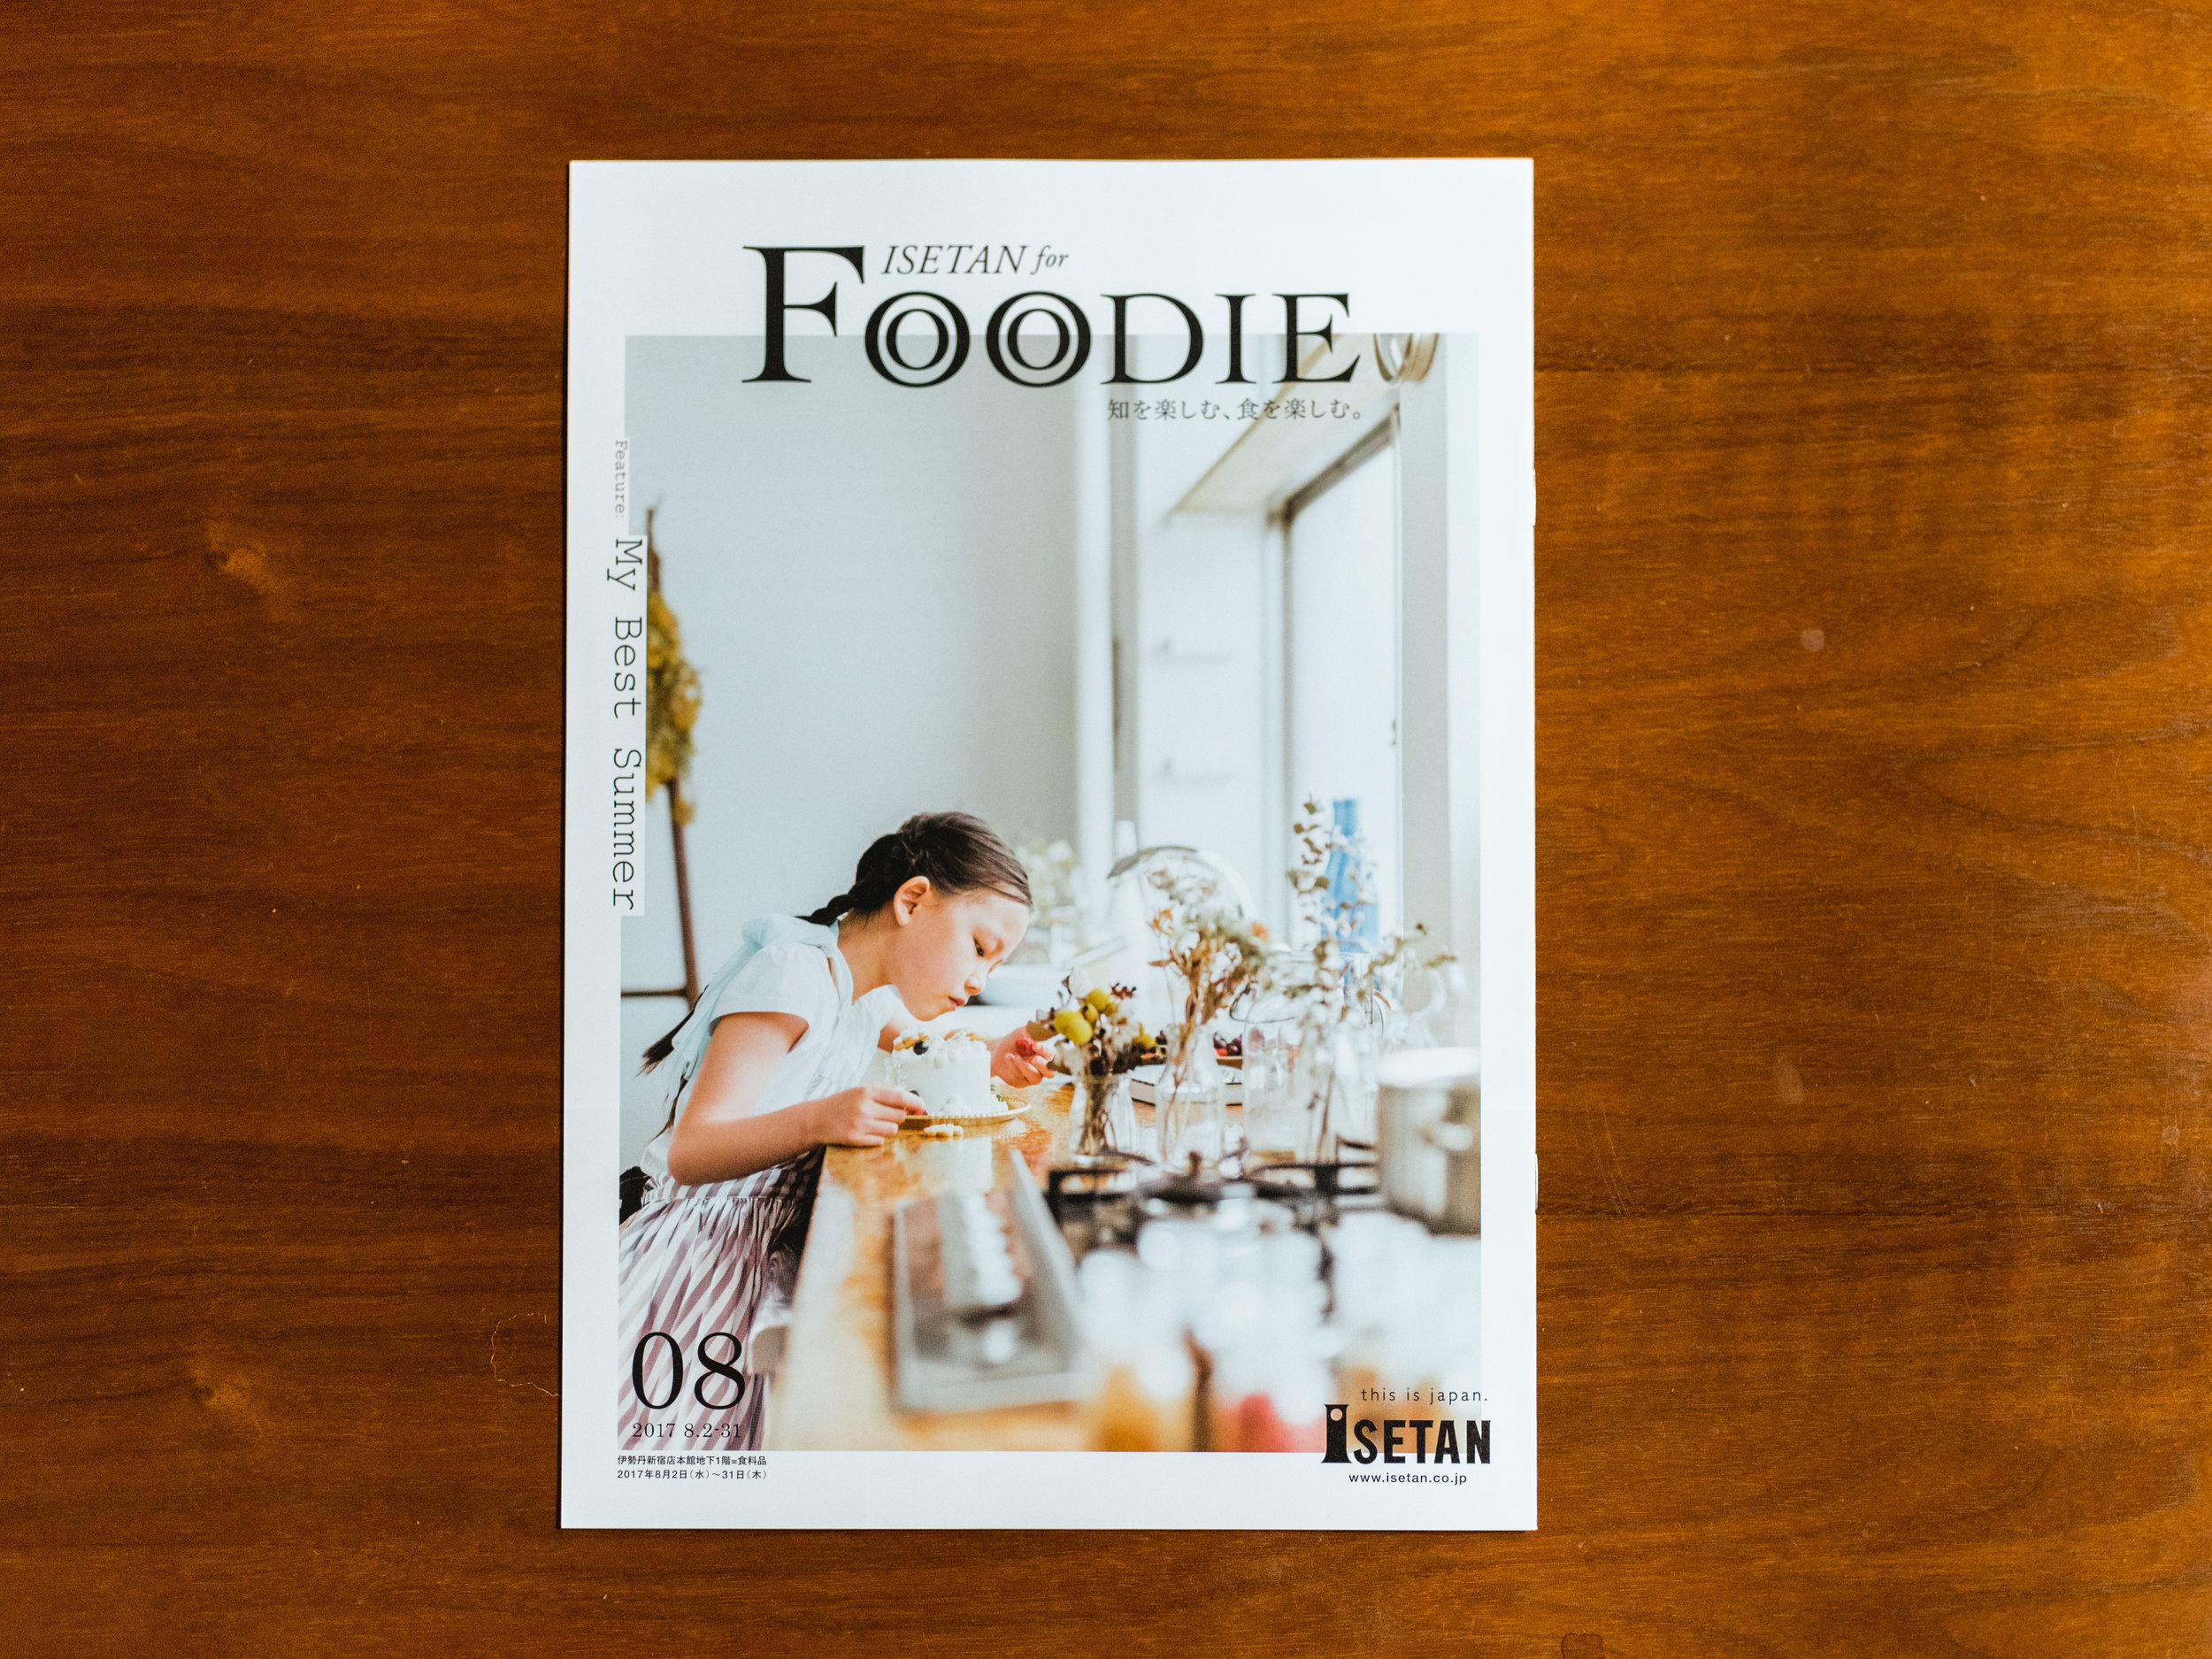 ISETAN for FOODIE 08月号表紙の撮影担当させていただいております。